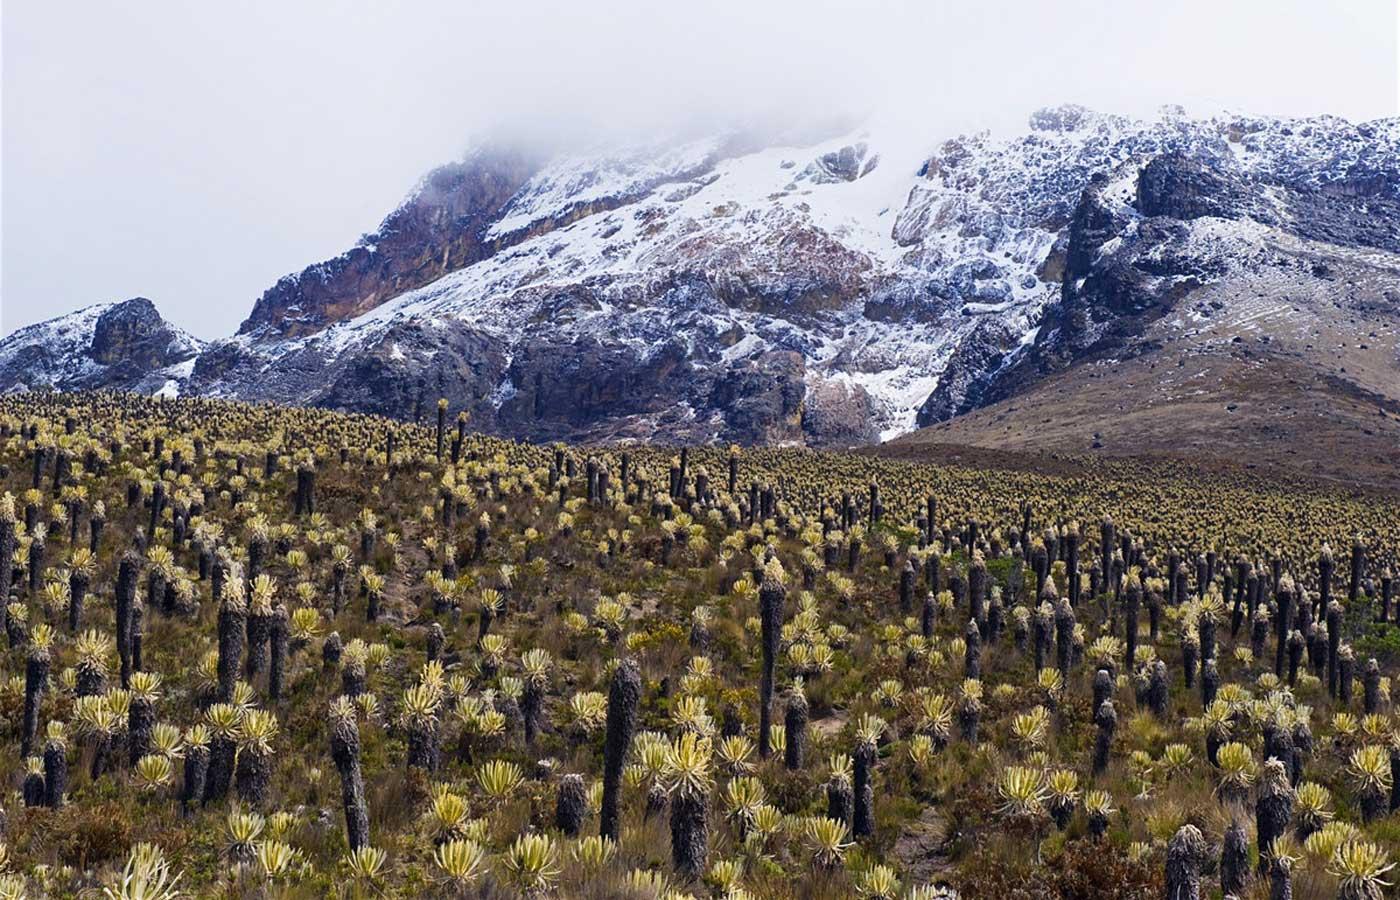 Los Nevados National Park, Colombia